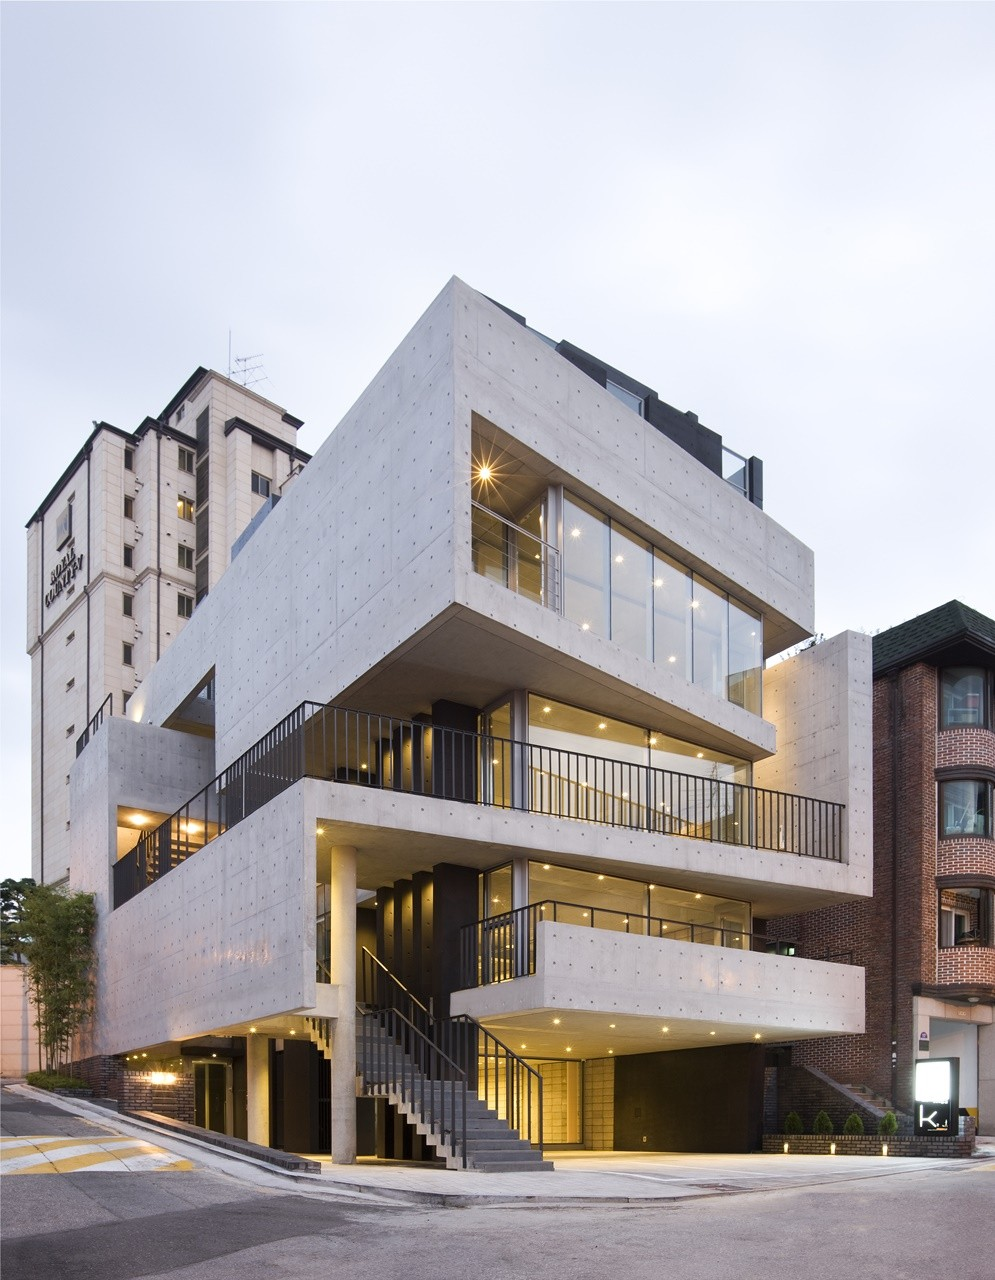 Marble Green Commercial Building Exteriors : Bati rieul l eau design archdaily